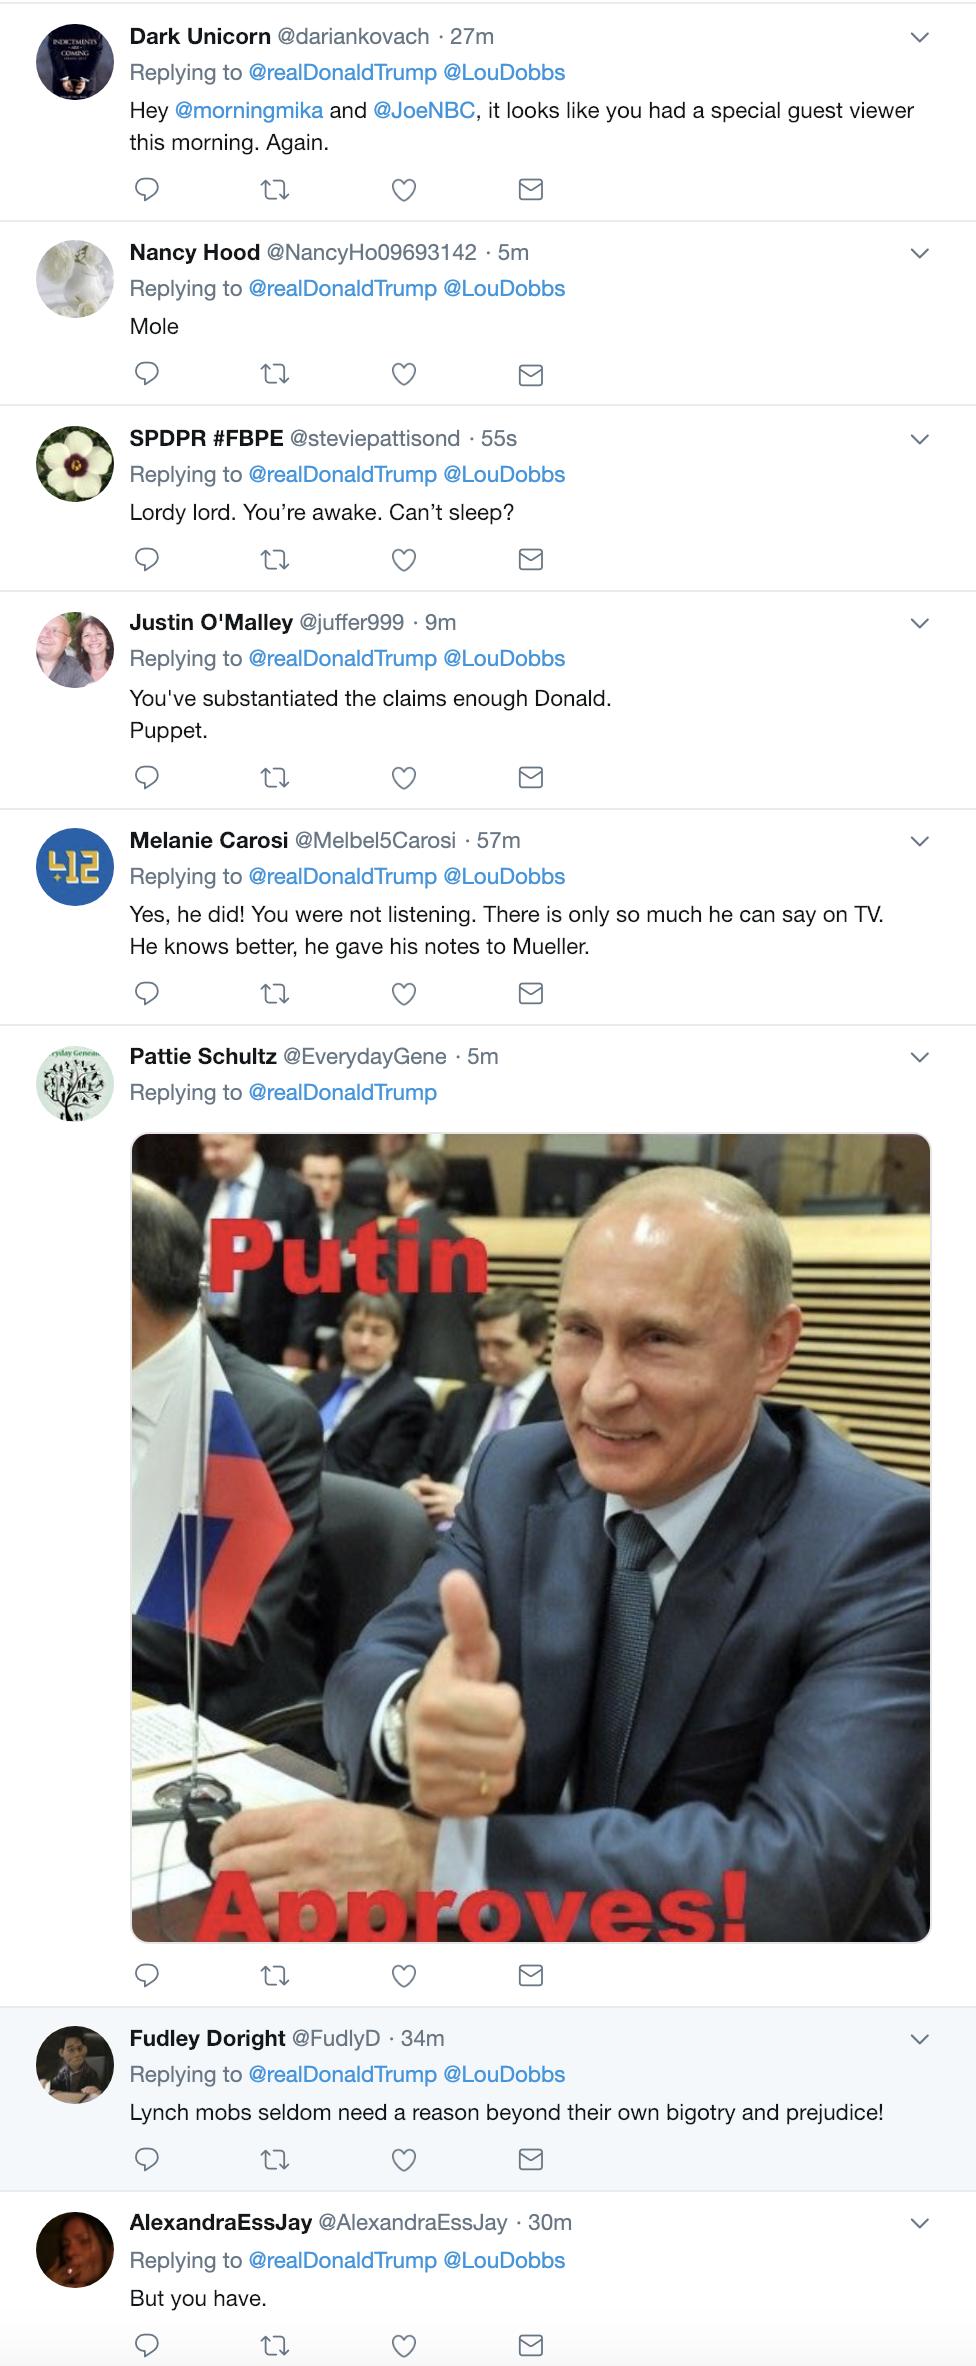 Screen-Shot-2019-02-20-at-7.13.41-AM Trump Wakes In A Tizzy, Unleashes 5-Tweet Ramble Like A Mental Patient Corruption Crime Donald Trump James Comey Mueller Politics Robert Mueller Russia Top Stories